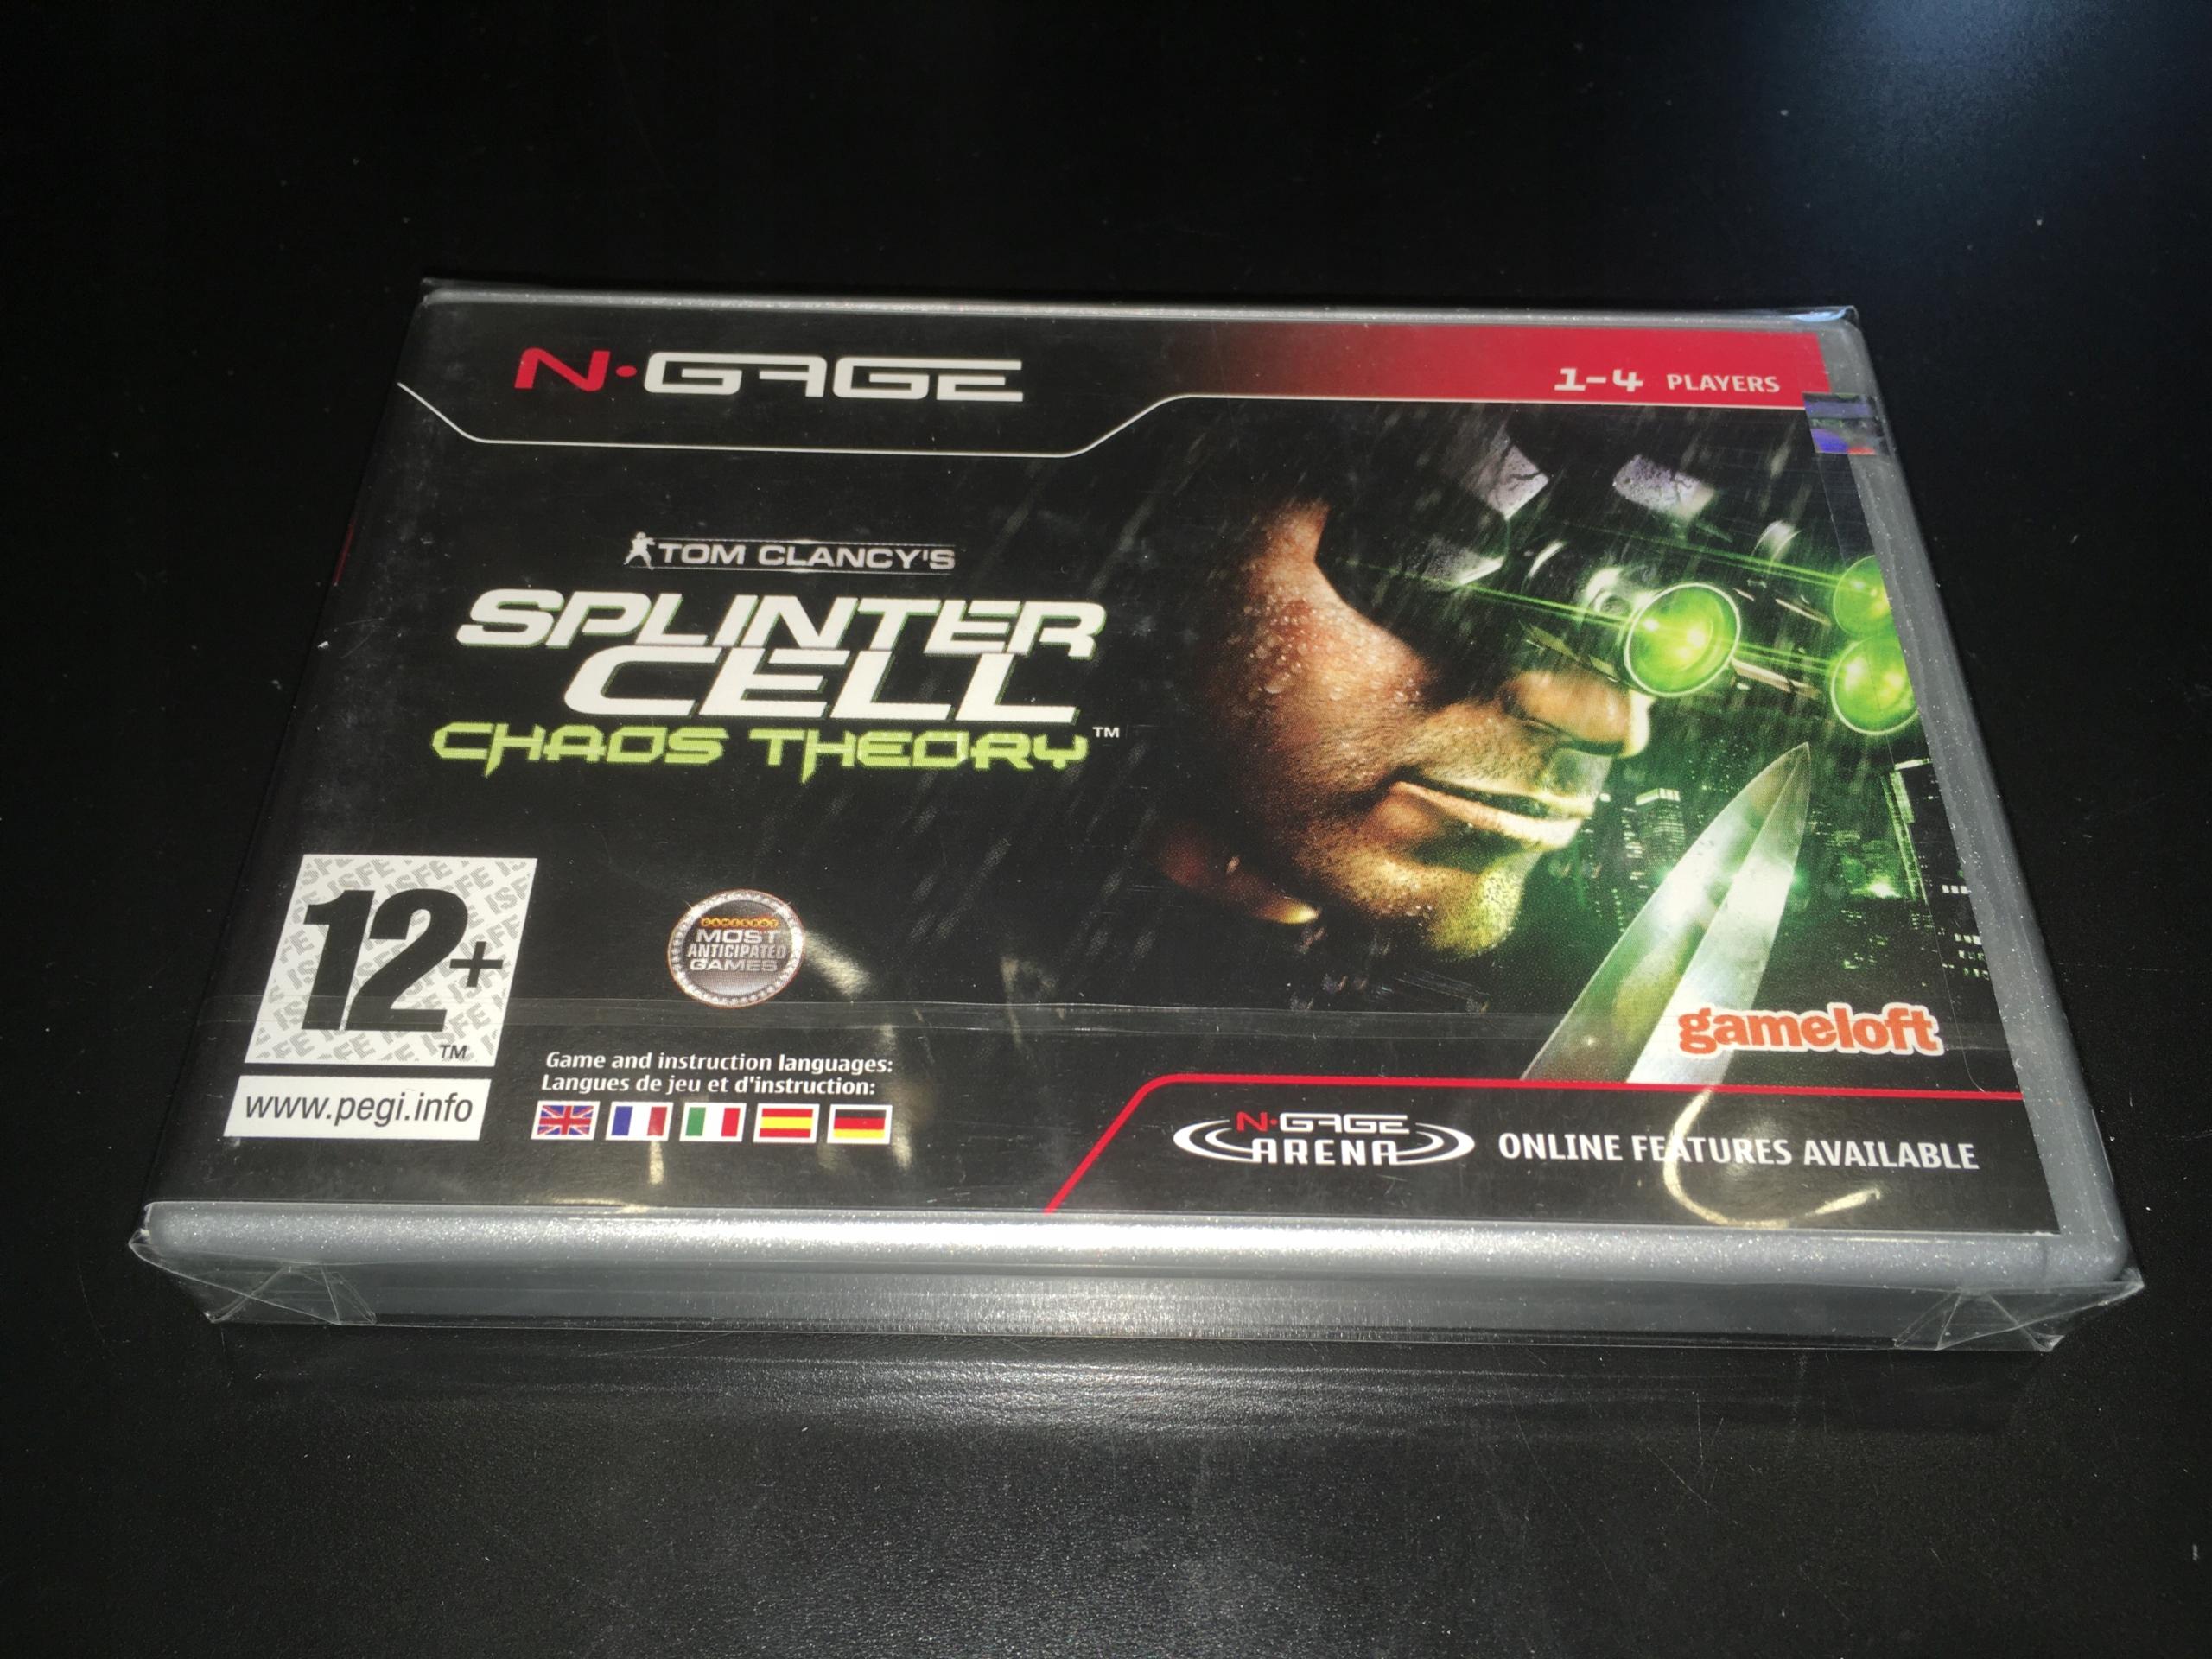 Splinter Cell Chaos Theory / Nokia N-Gage